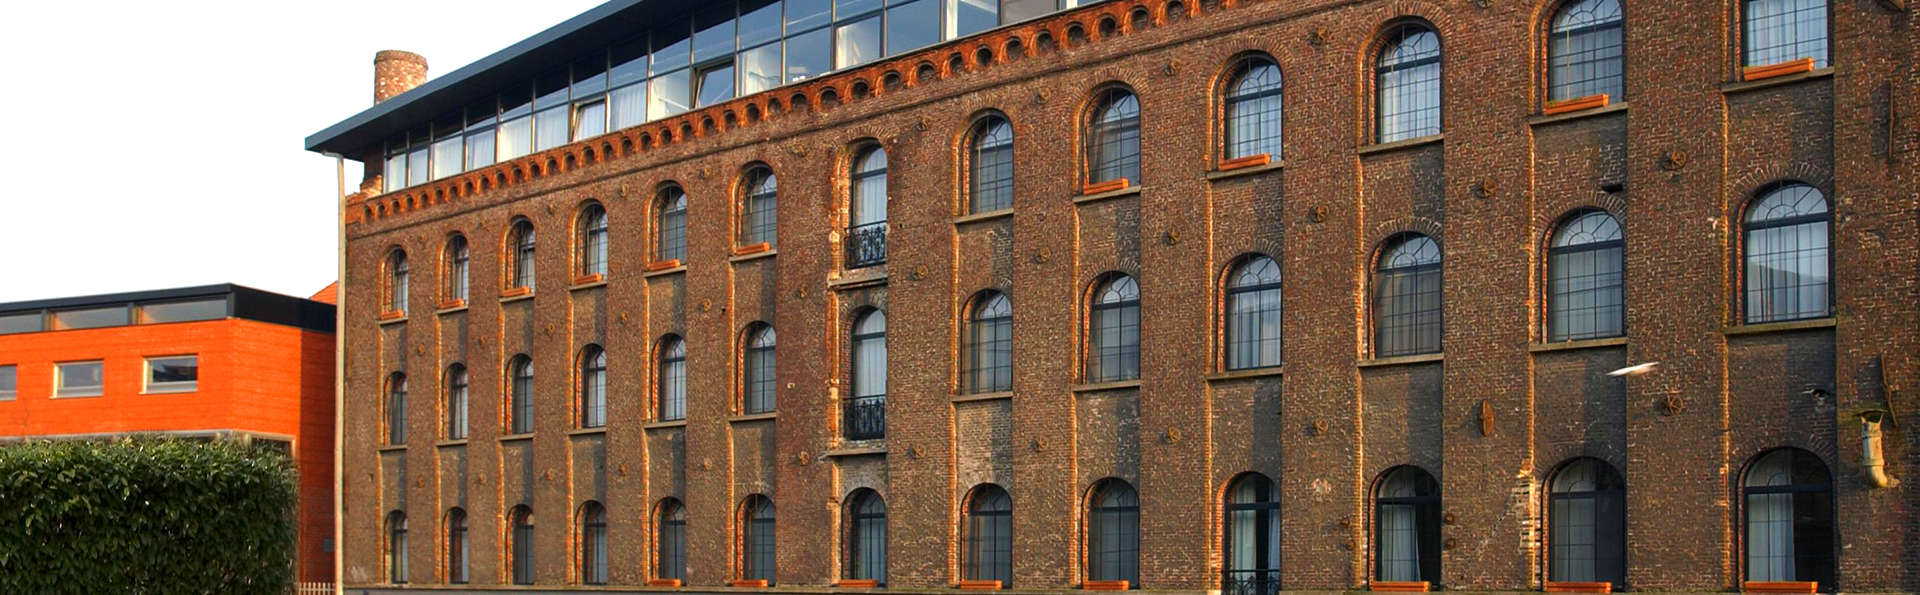 Ghent River hotel - EDIT_Exterior.jpg